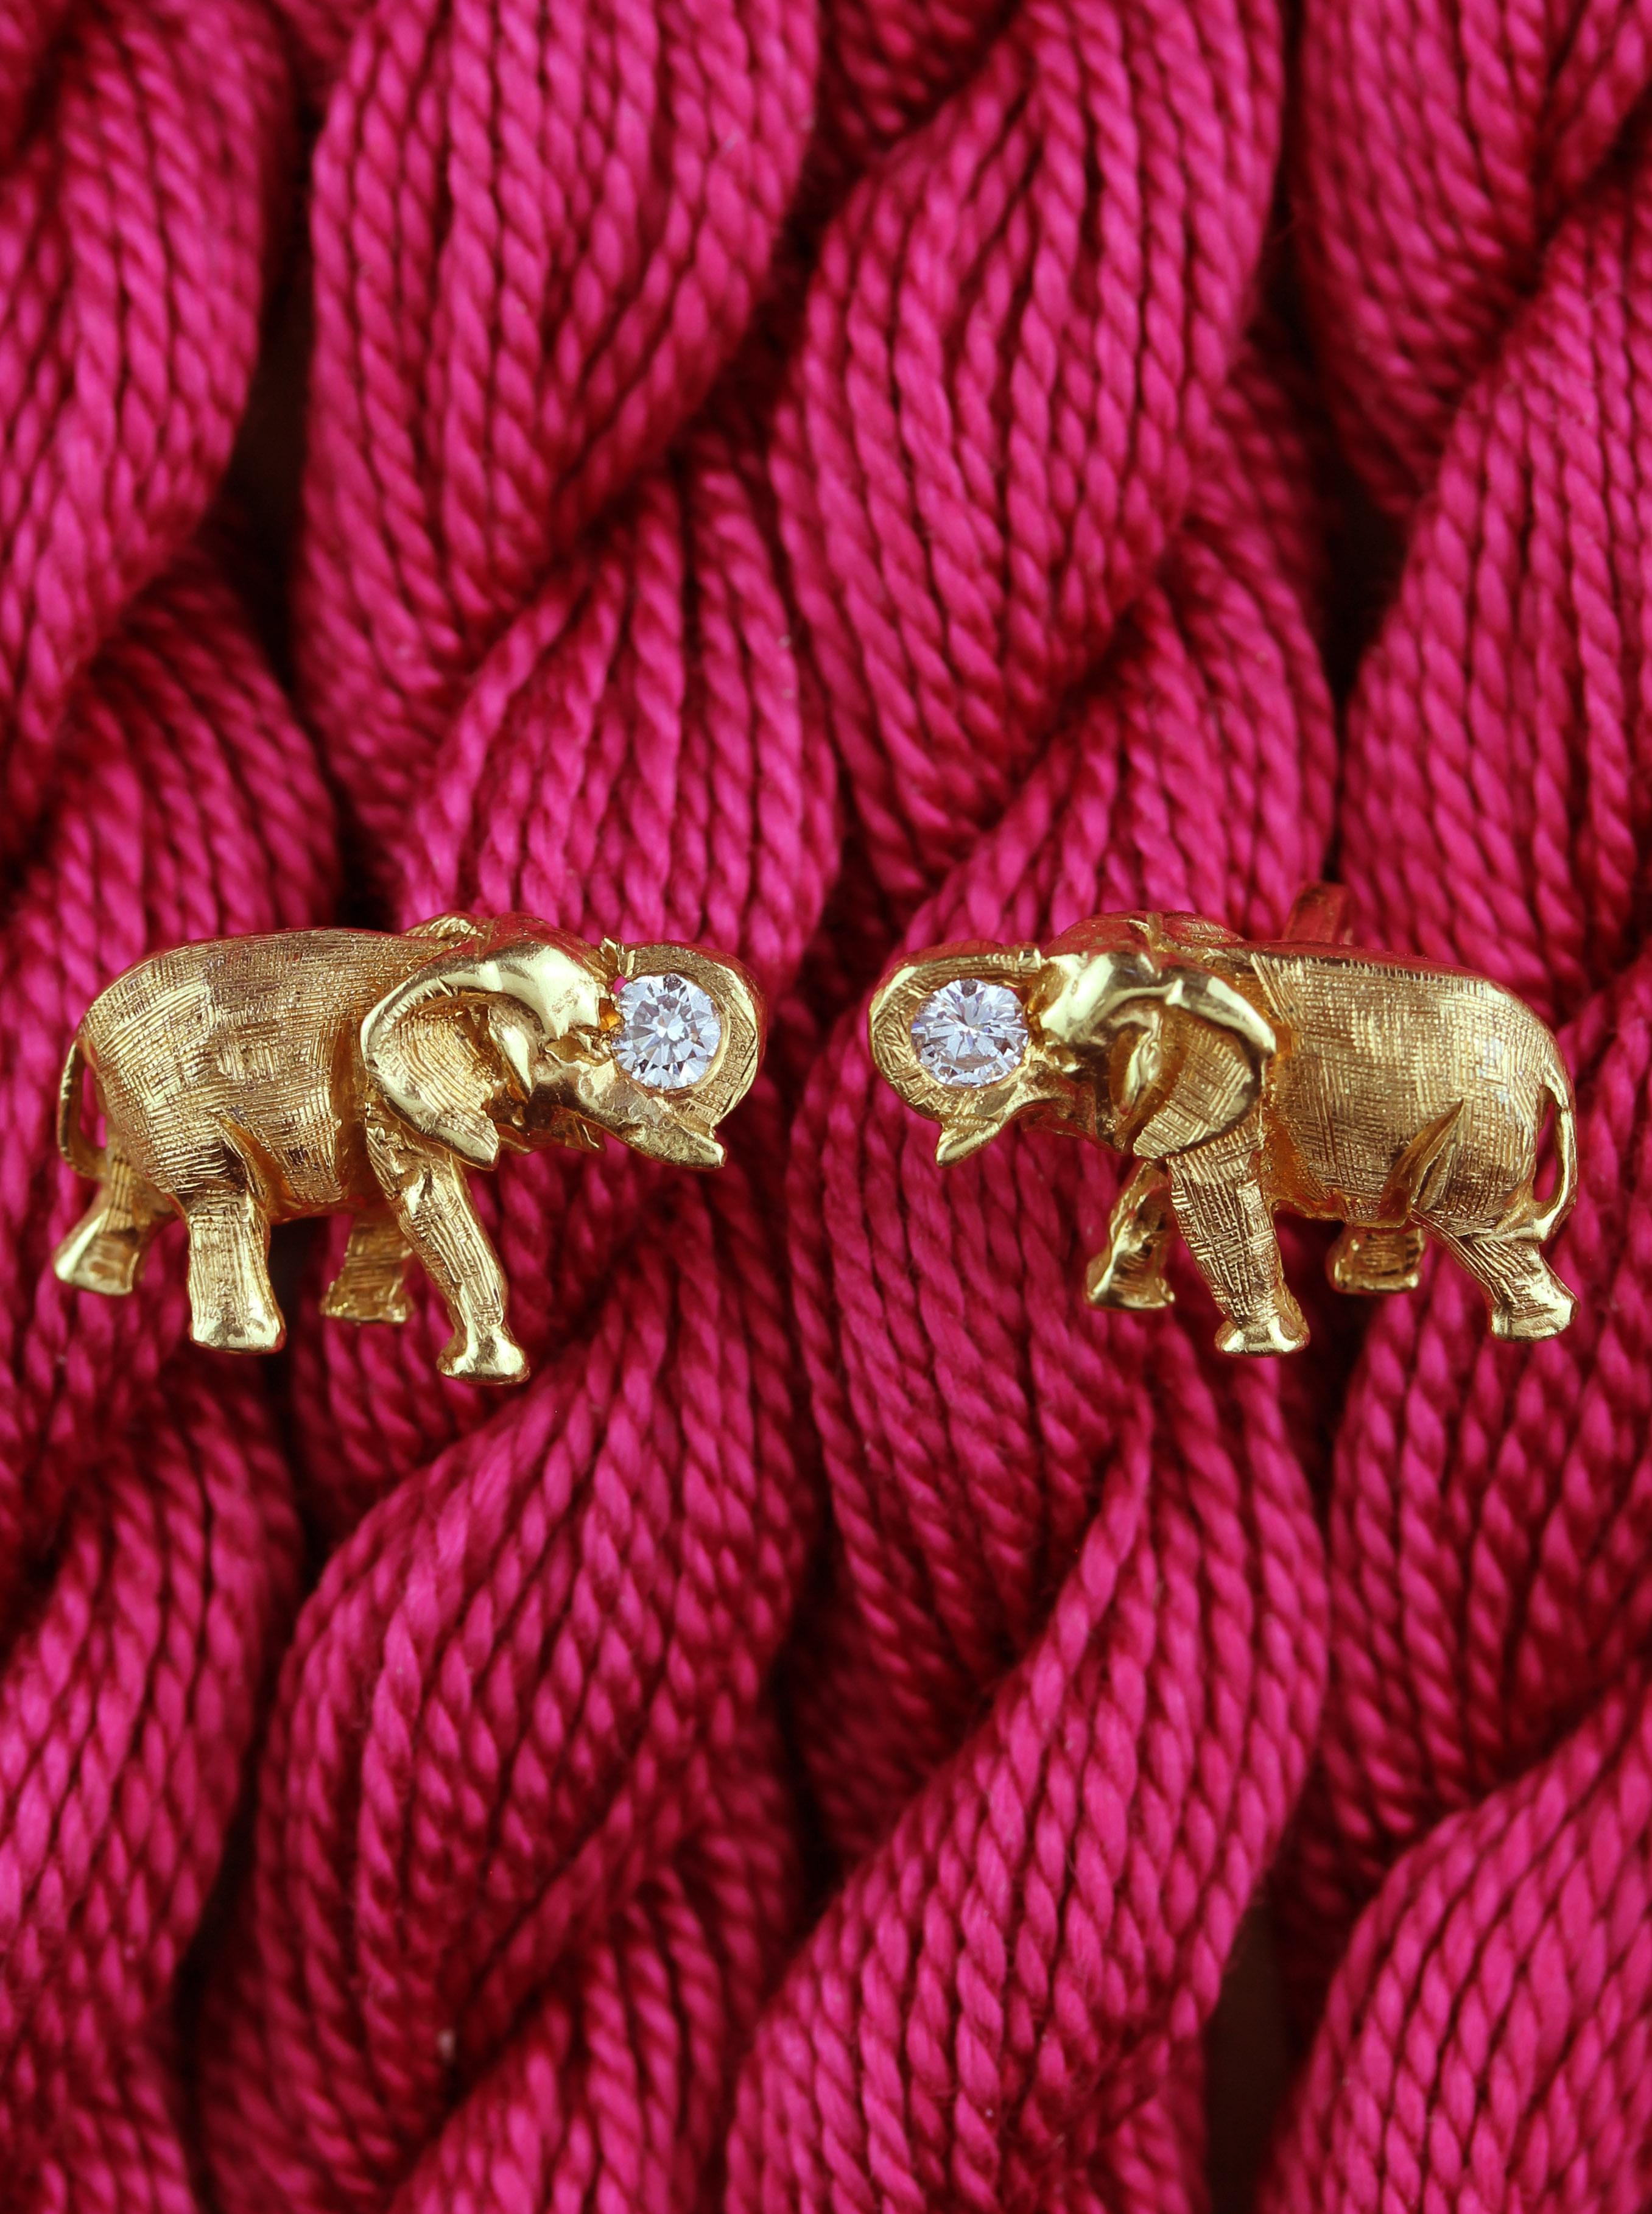 Handmade cufflinks in form of elephant with diamonds